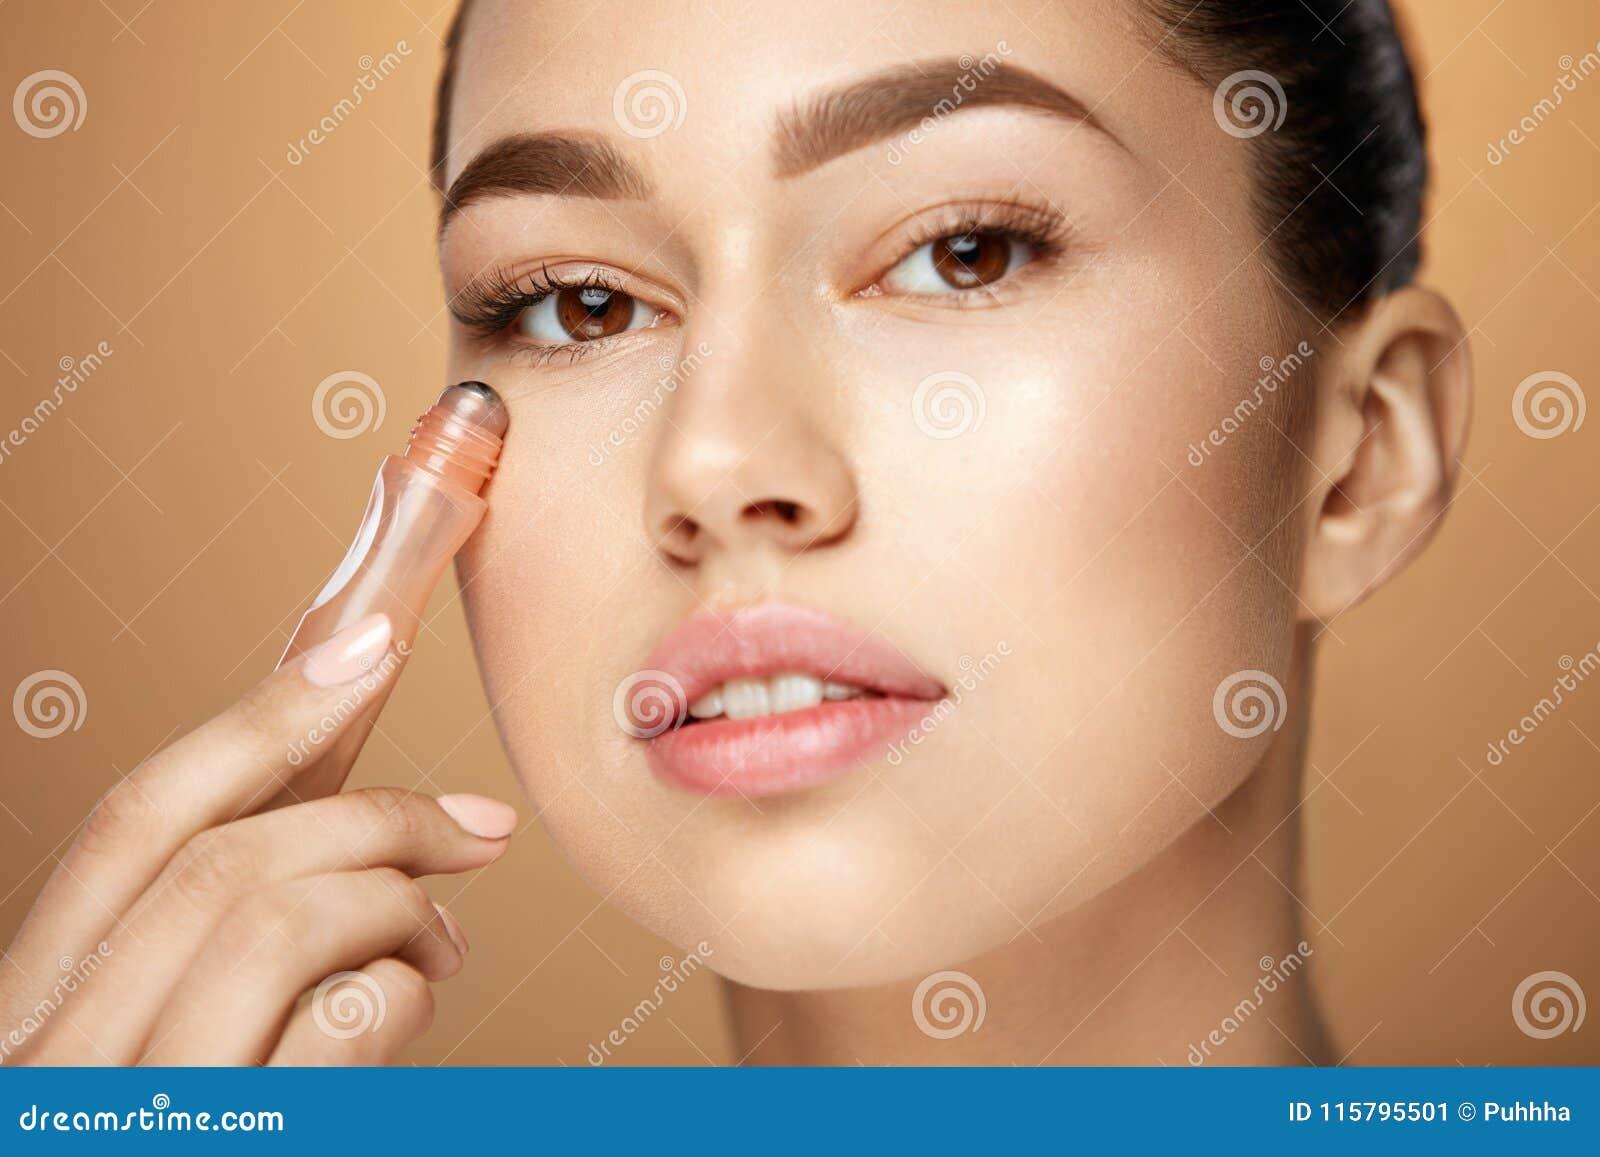 Eye Skin Beauty  Woman Using Cream Under Eyes Stock Image